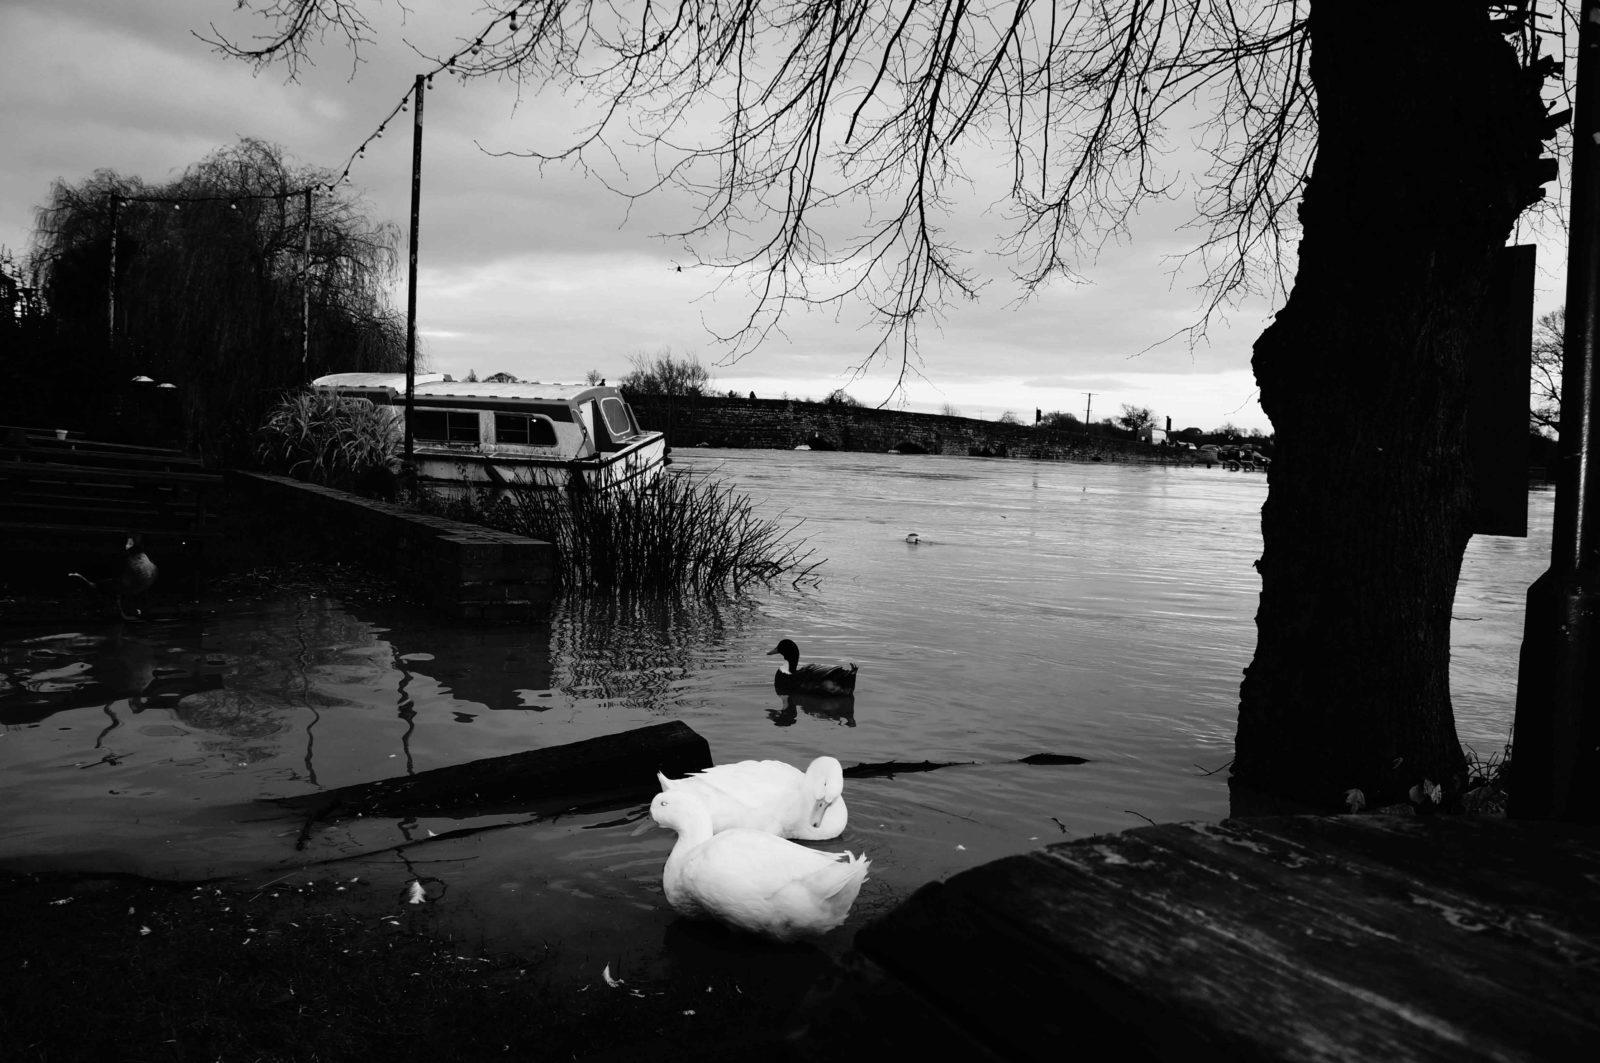 Natural ducks